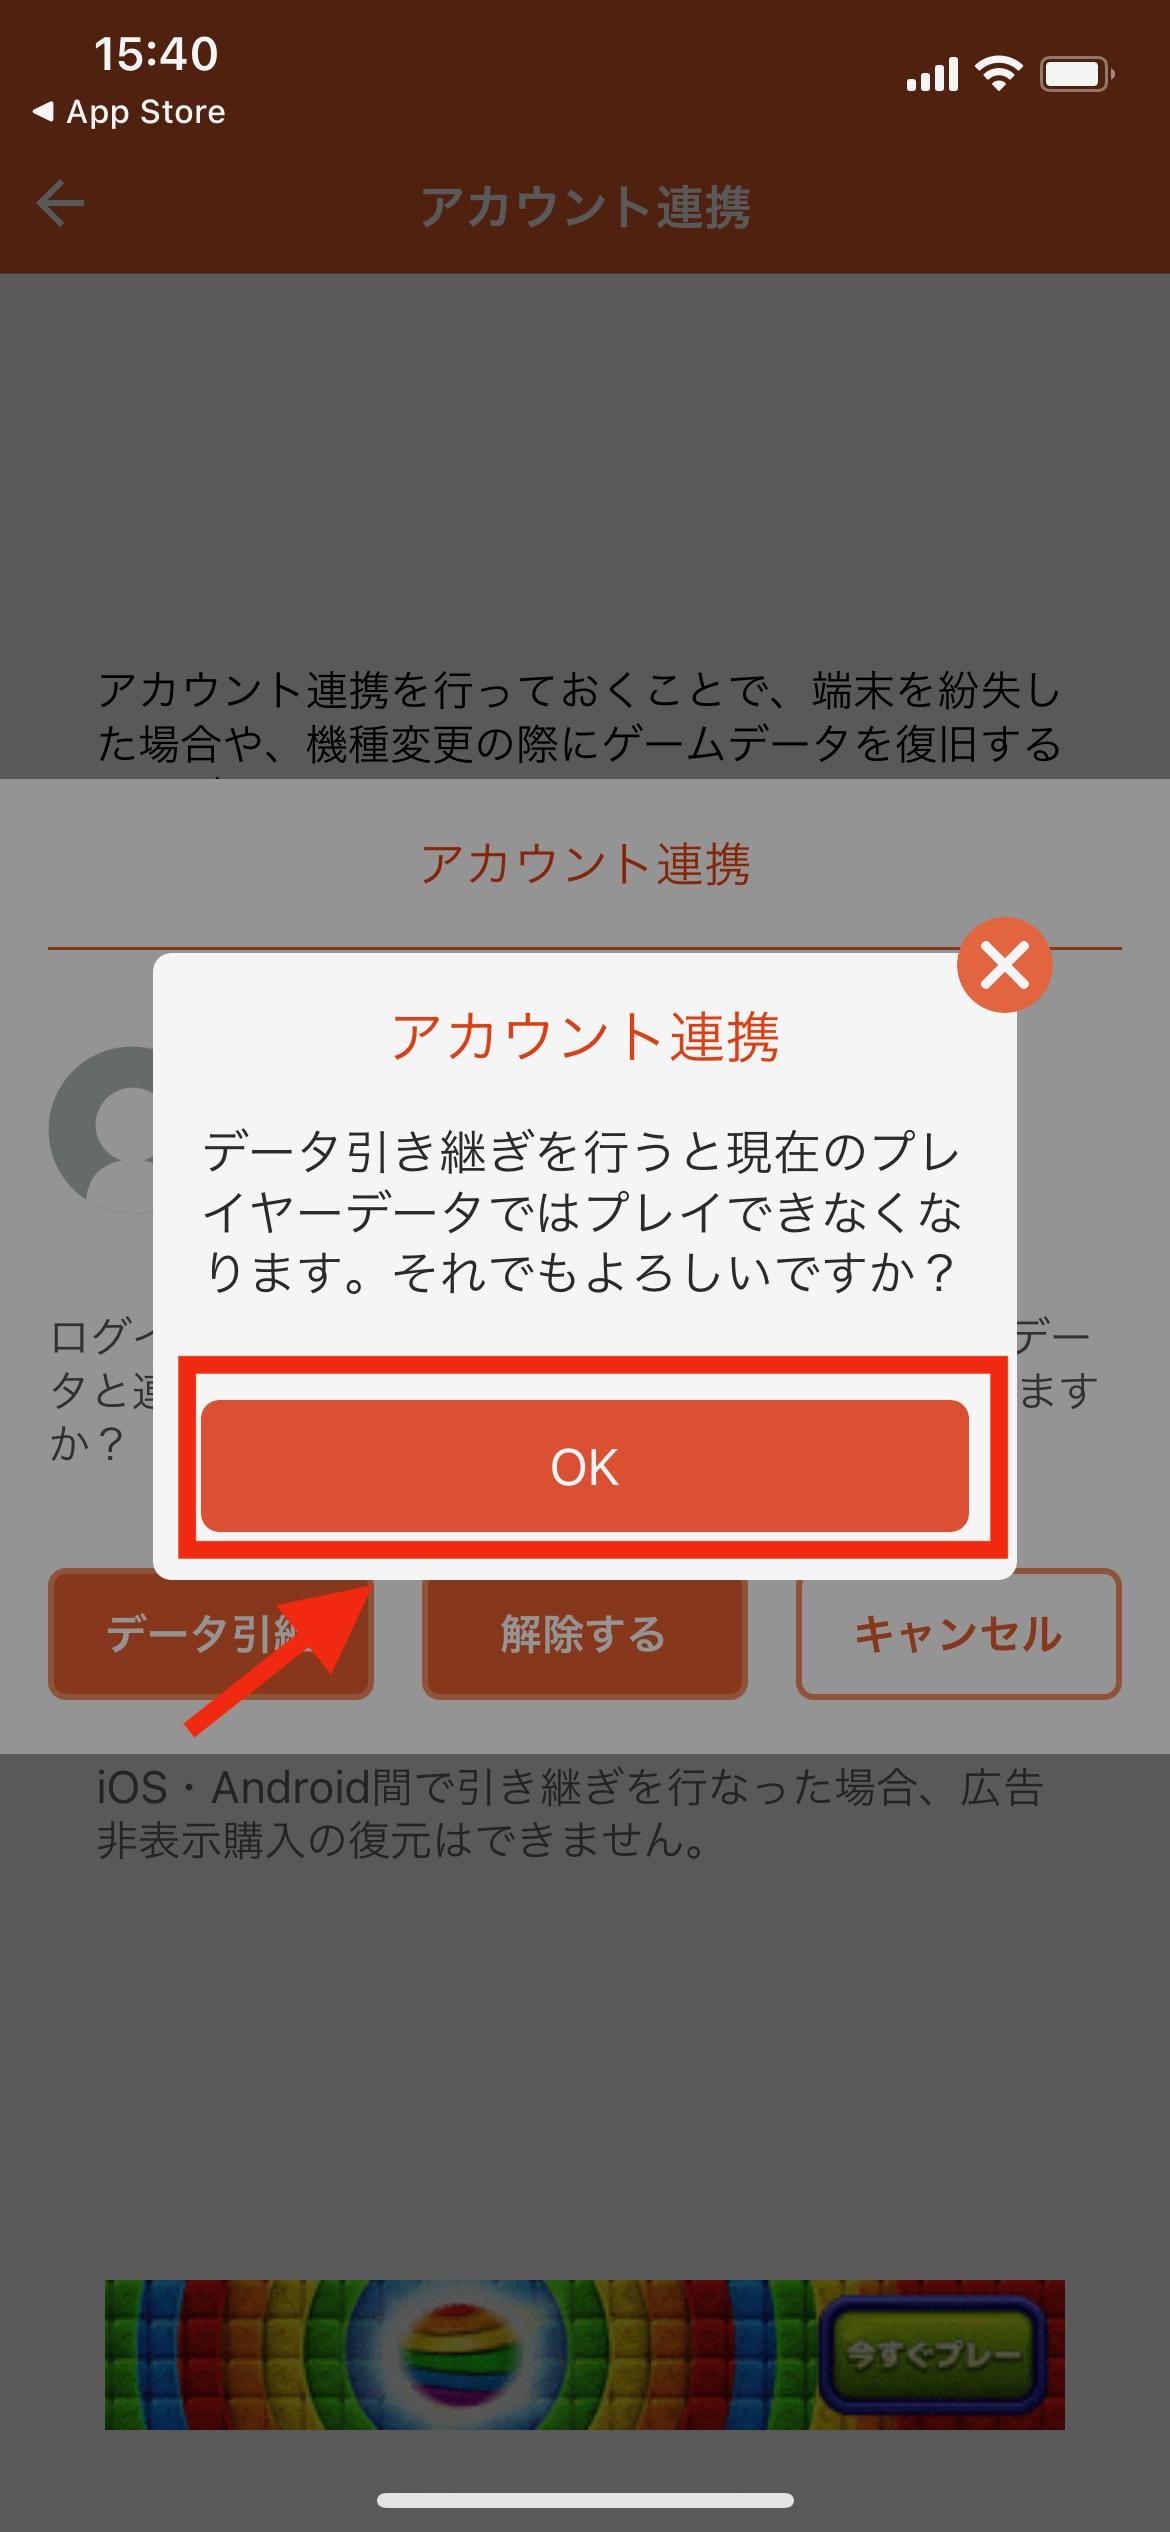 「OK」ボタンを押す